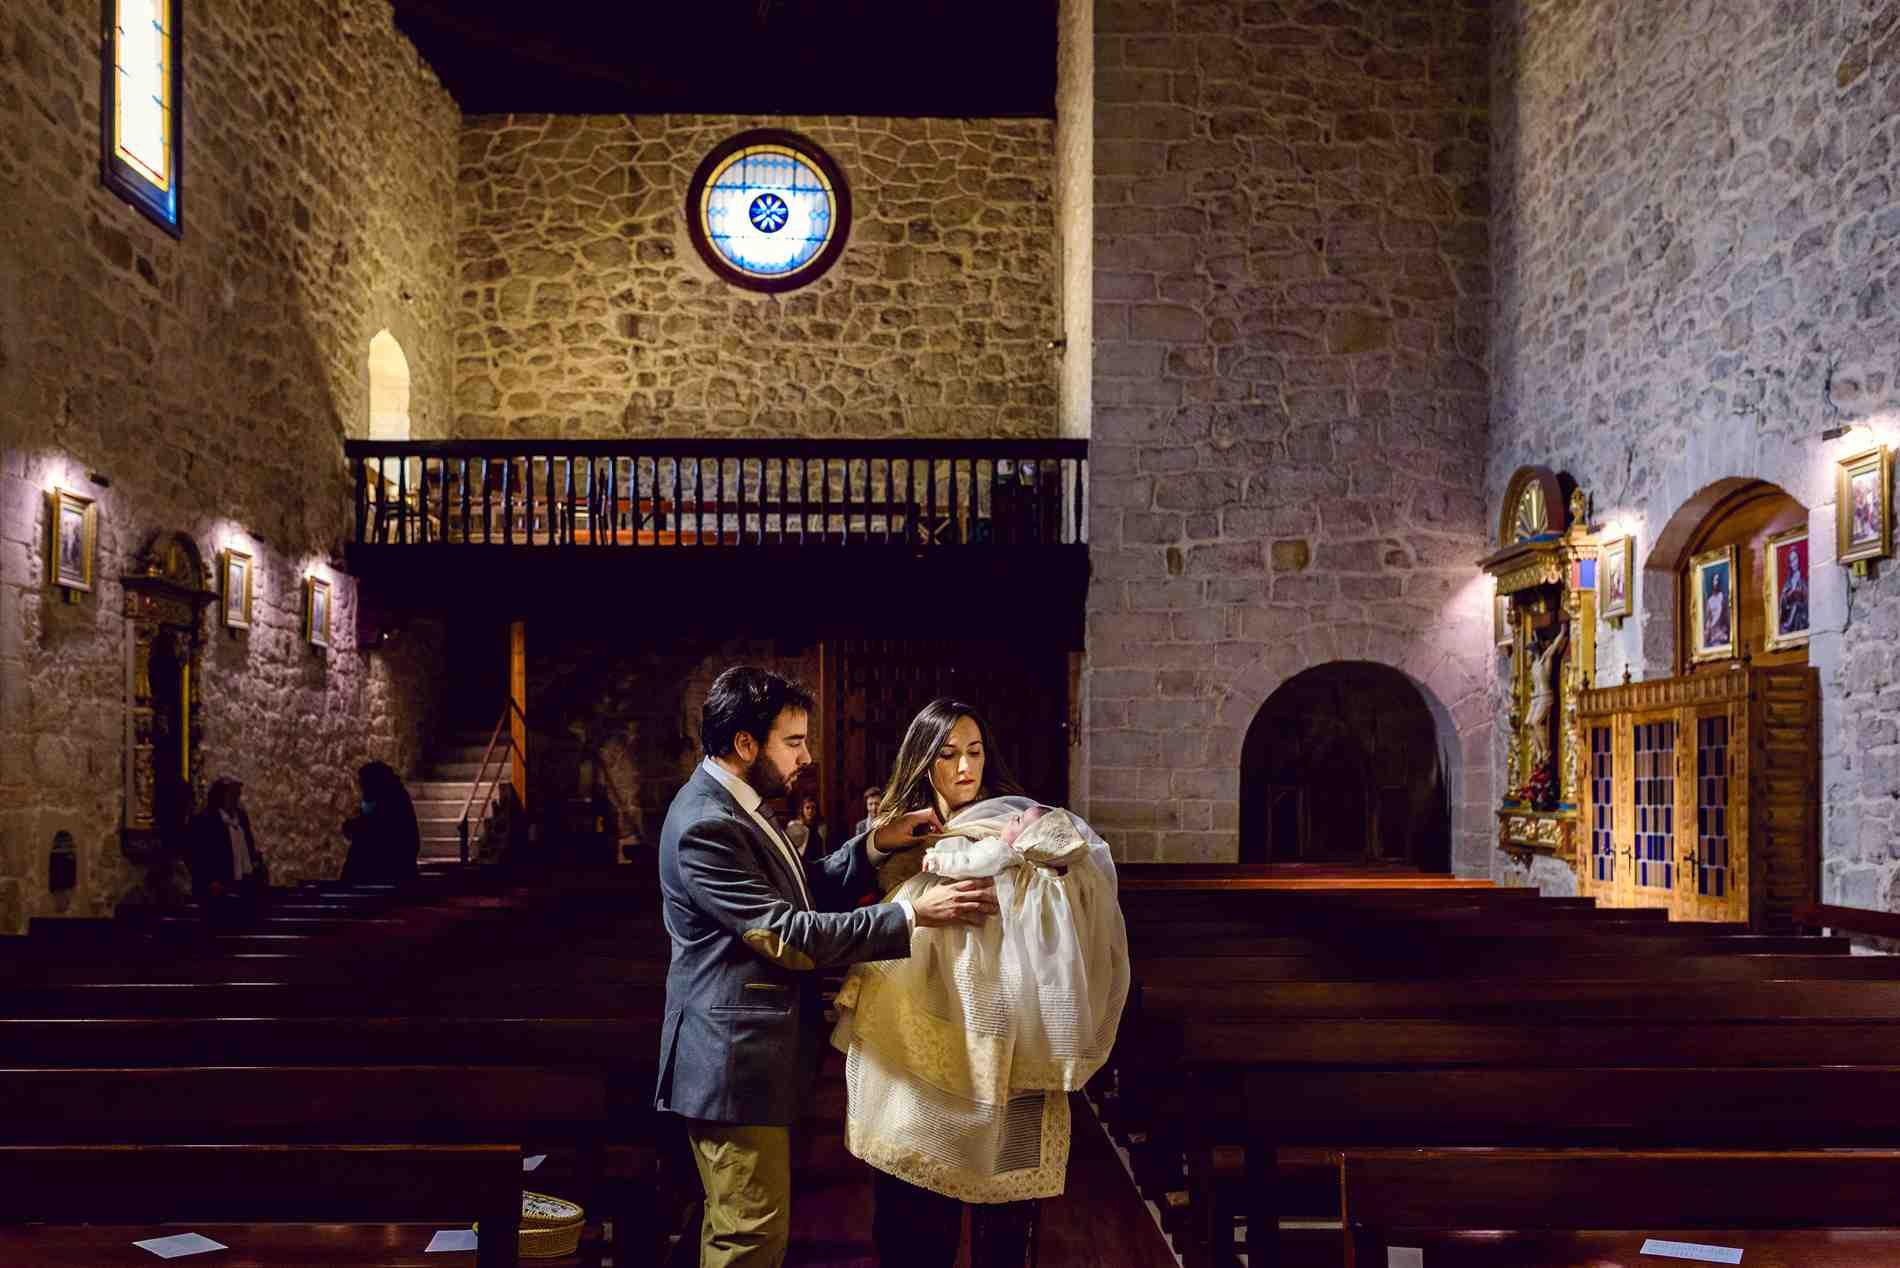 Fotógrafo para bautizos - Reportaje bautizo Toledo y Madrid